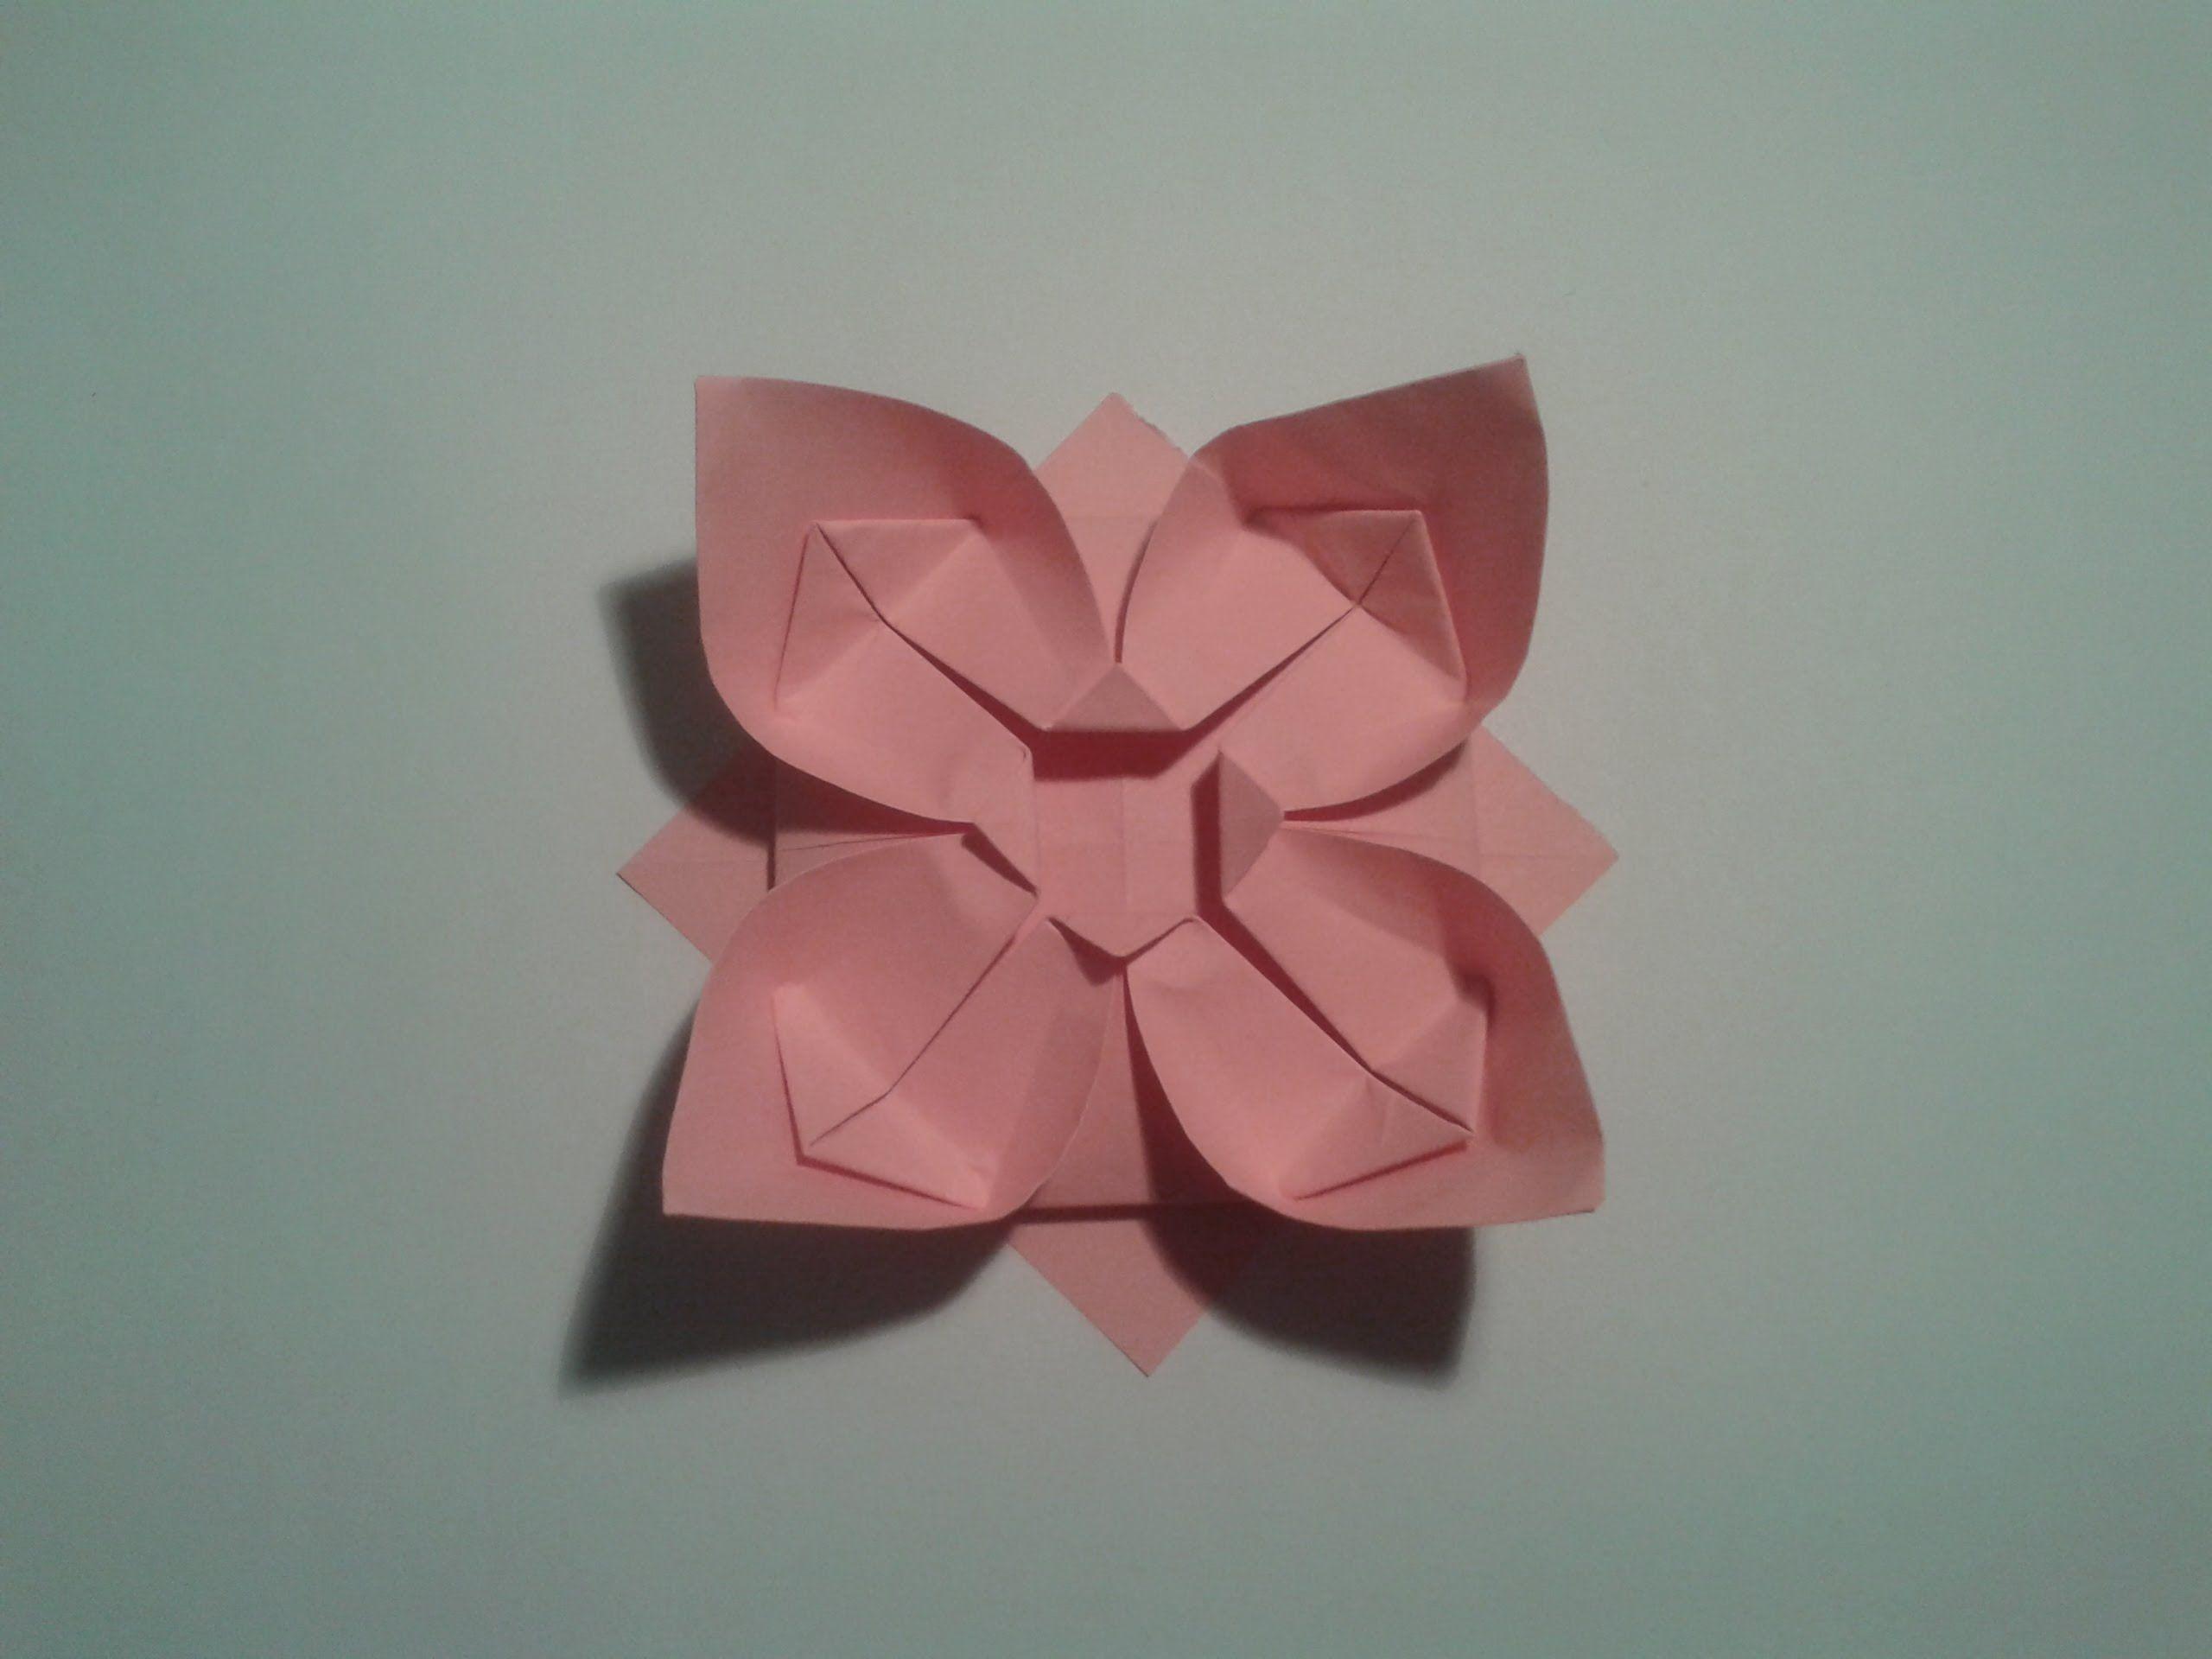 How To Make An Easy Origami Flower Pinterest Easy Origami